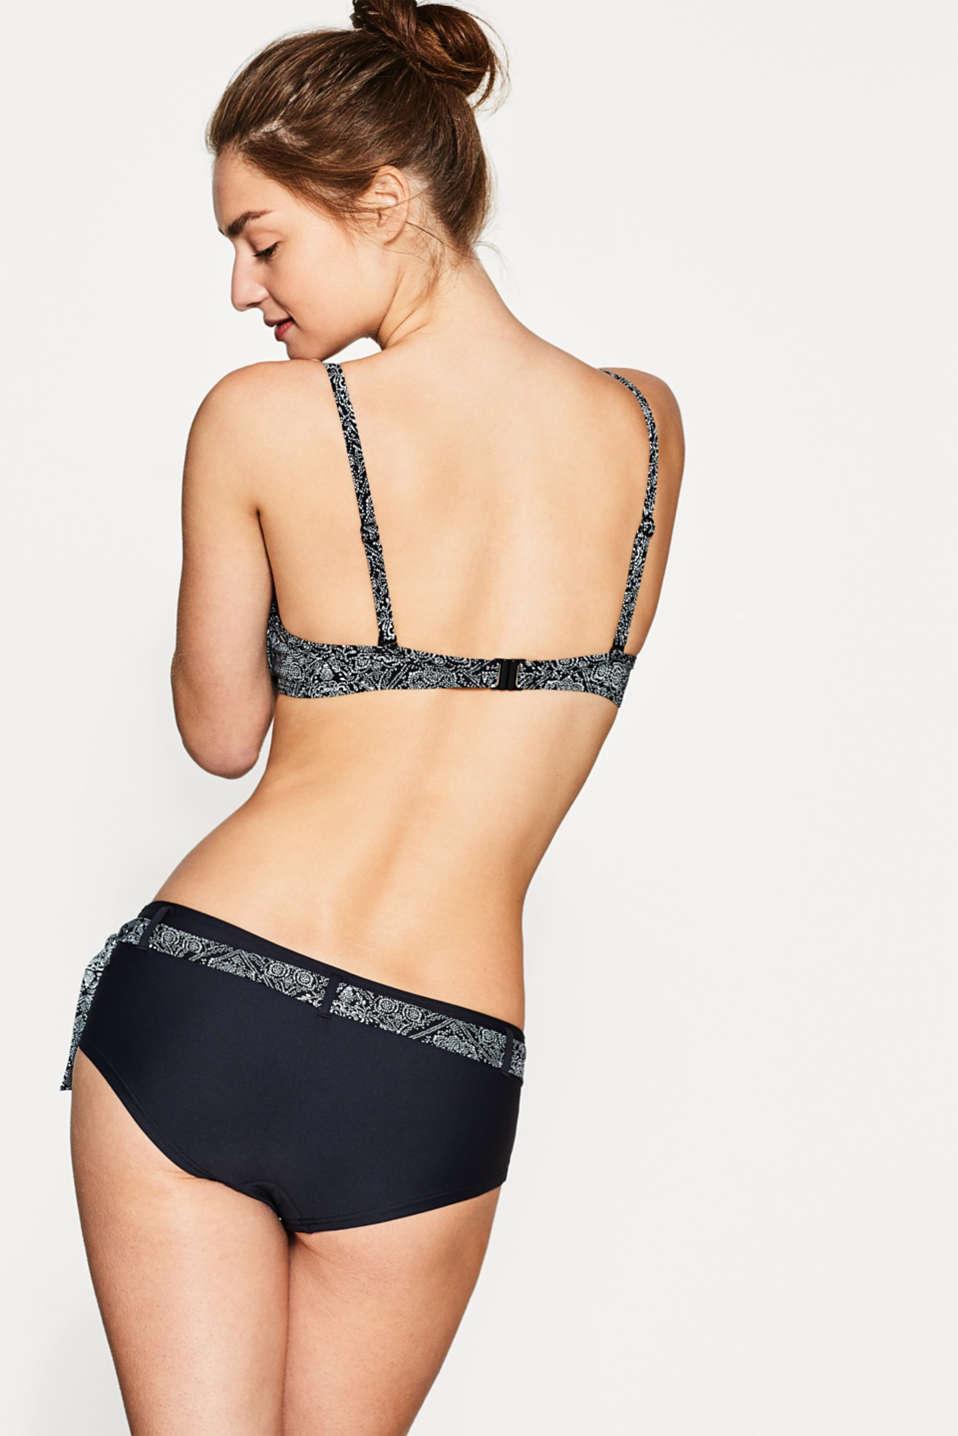 esprit bikini push up mit ornament print im online shop kaufen. Black Bedroom Furniture Sets. Home Design Ideas